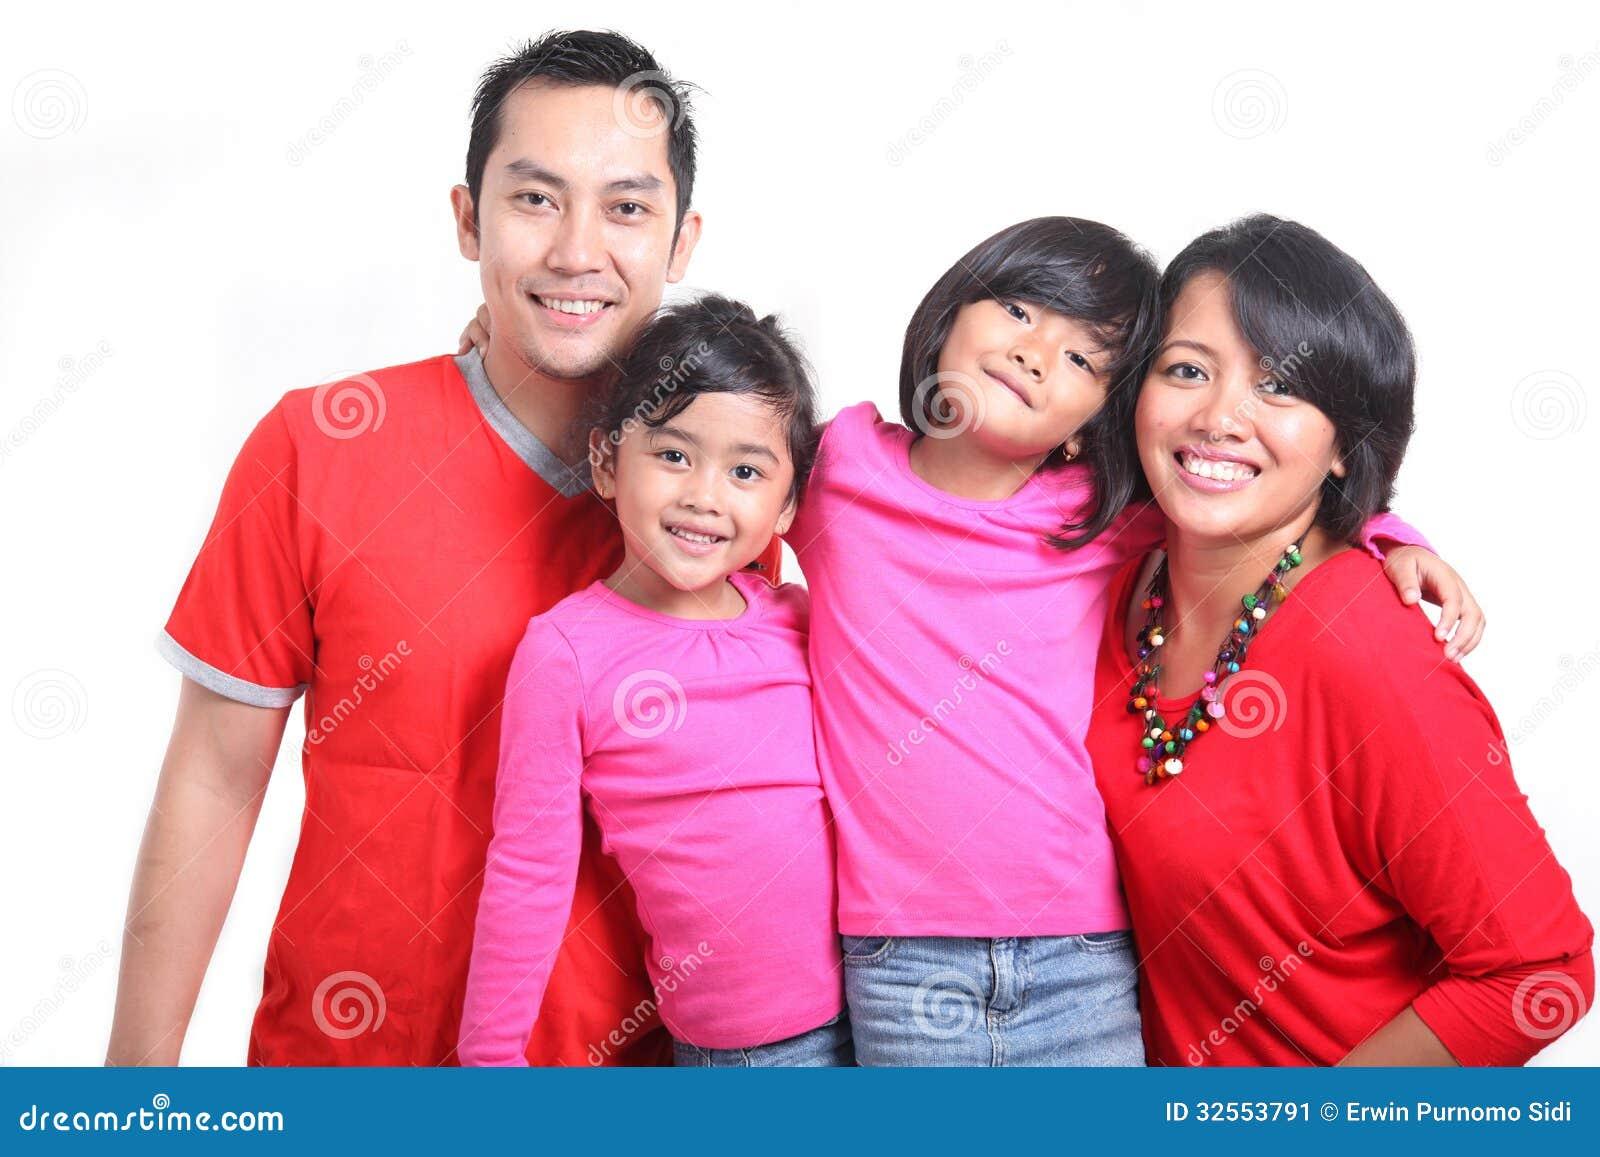 southeast asian families